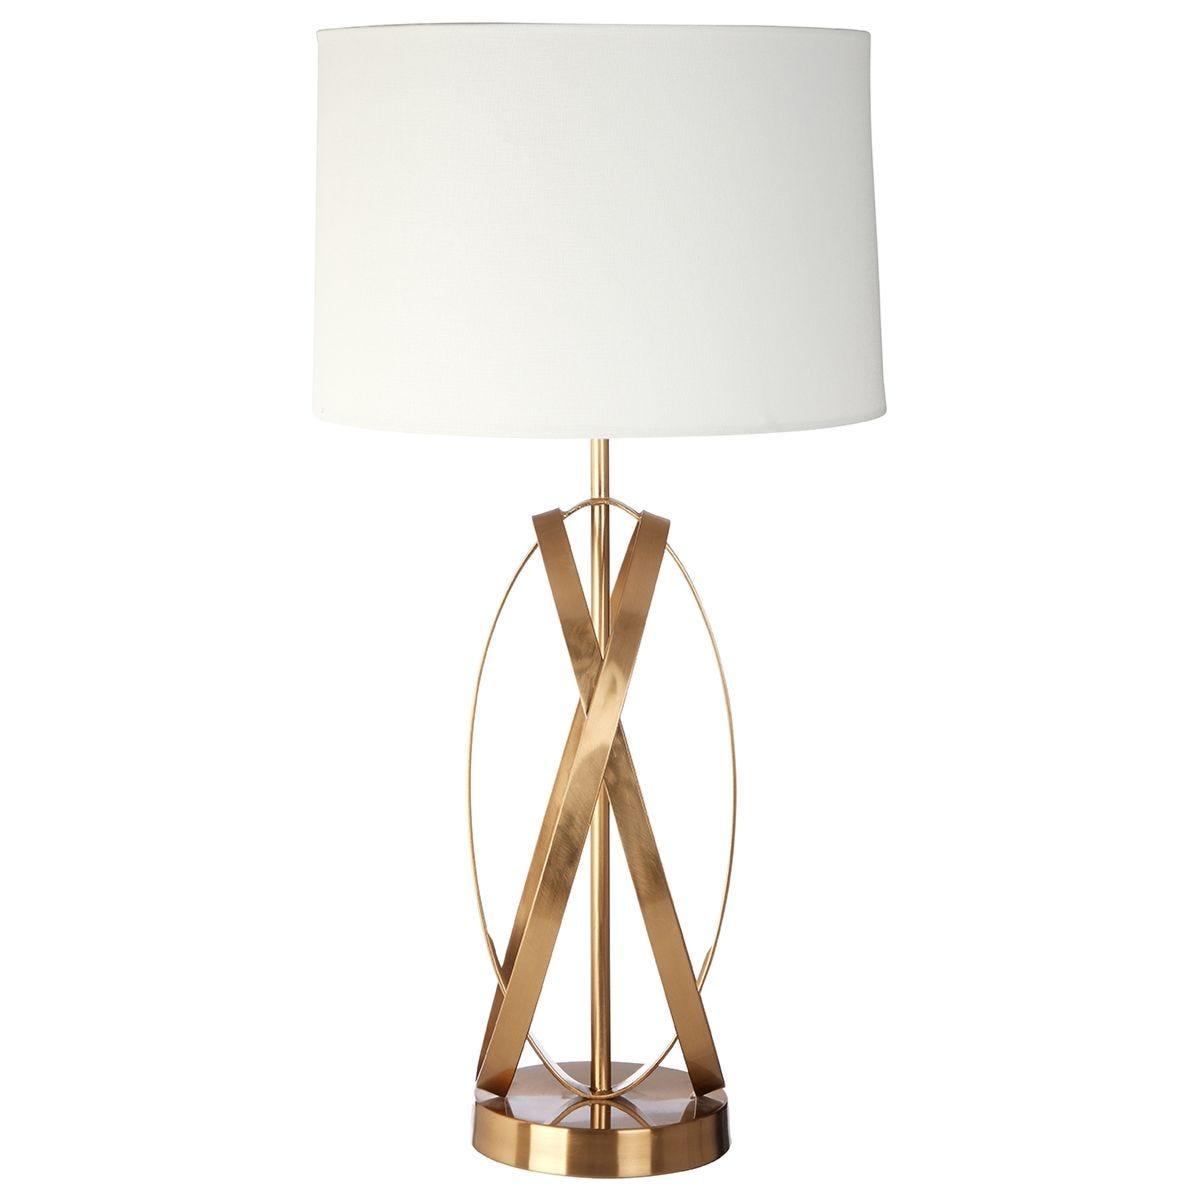 Premier Housewares Zaina Table Lamp in White/Gold Finish & Linen Shade